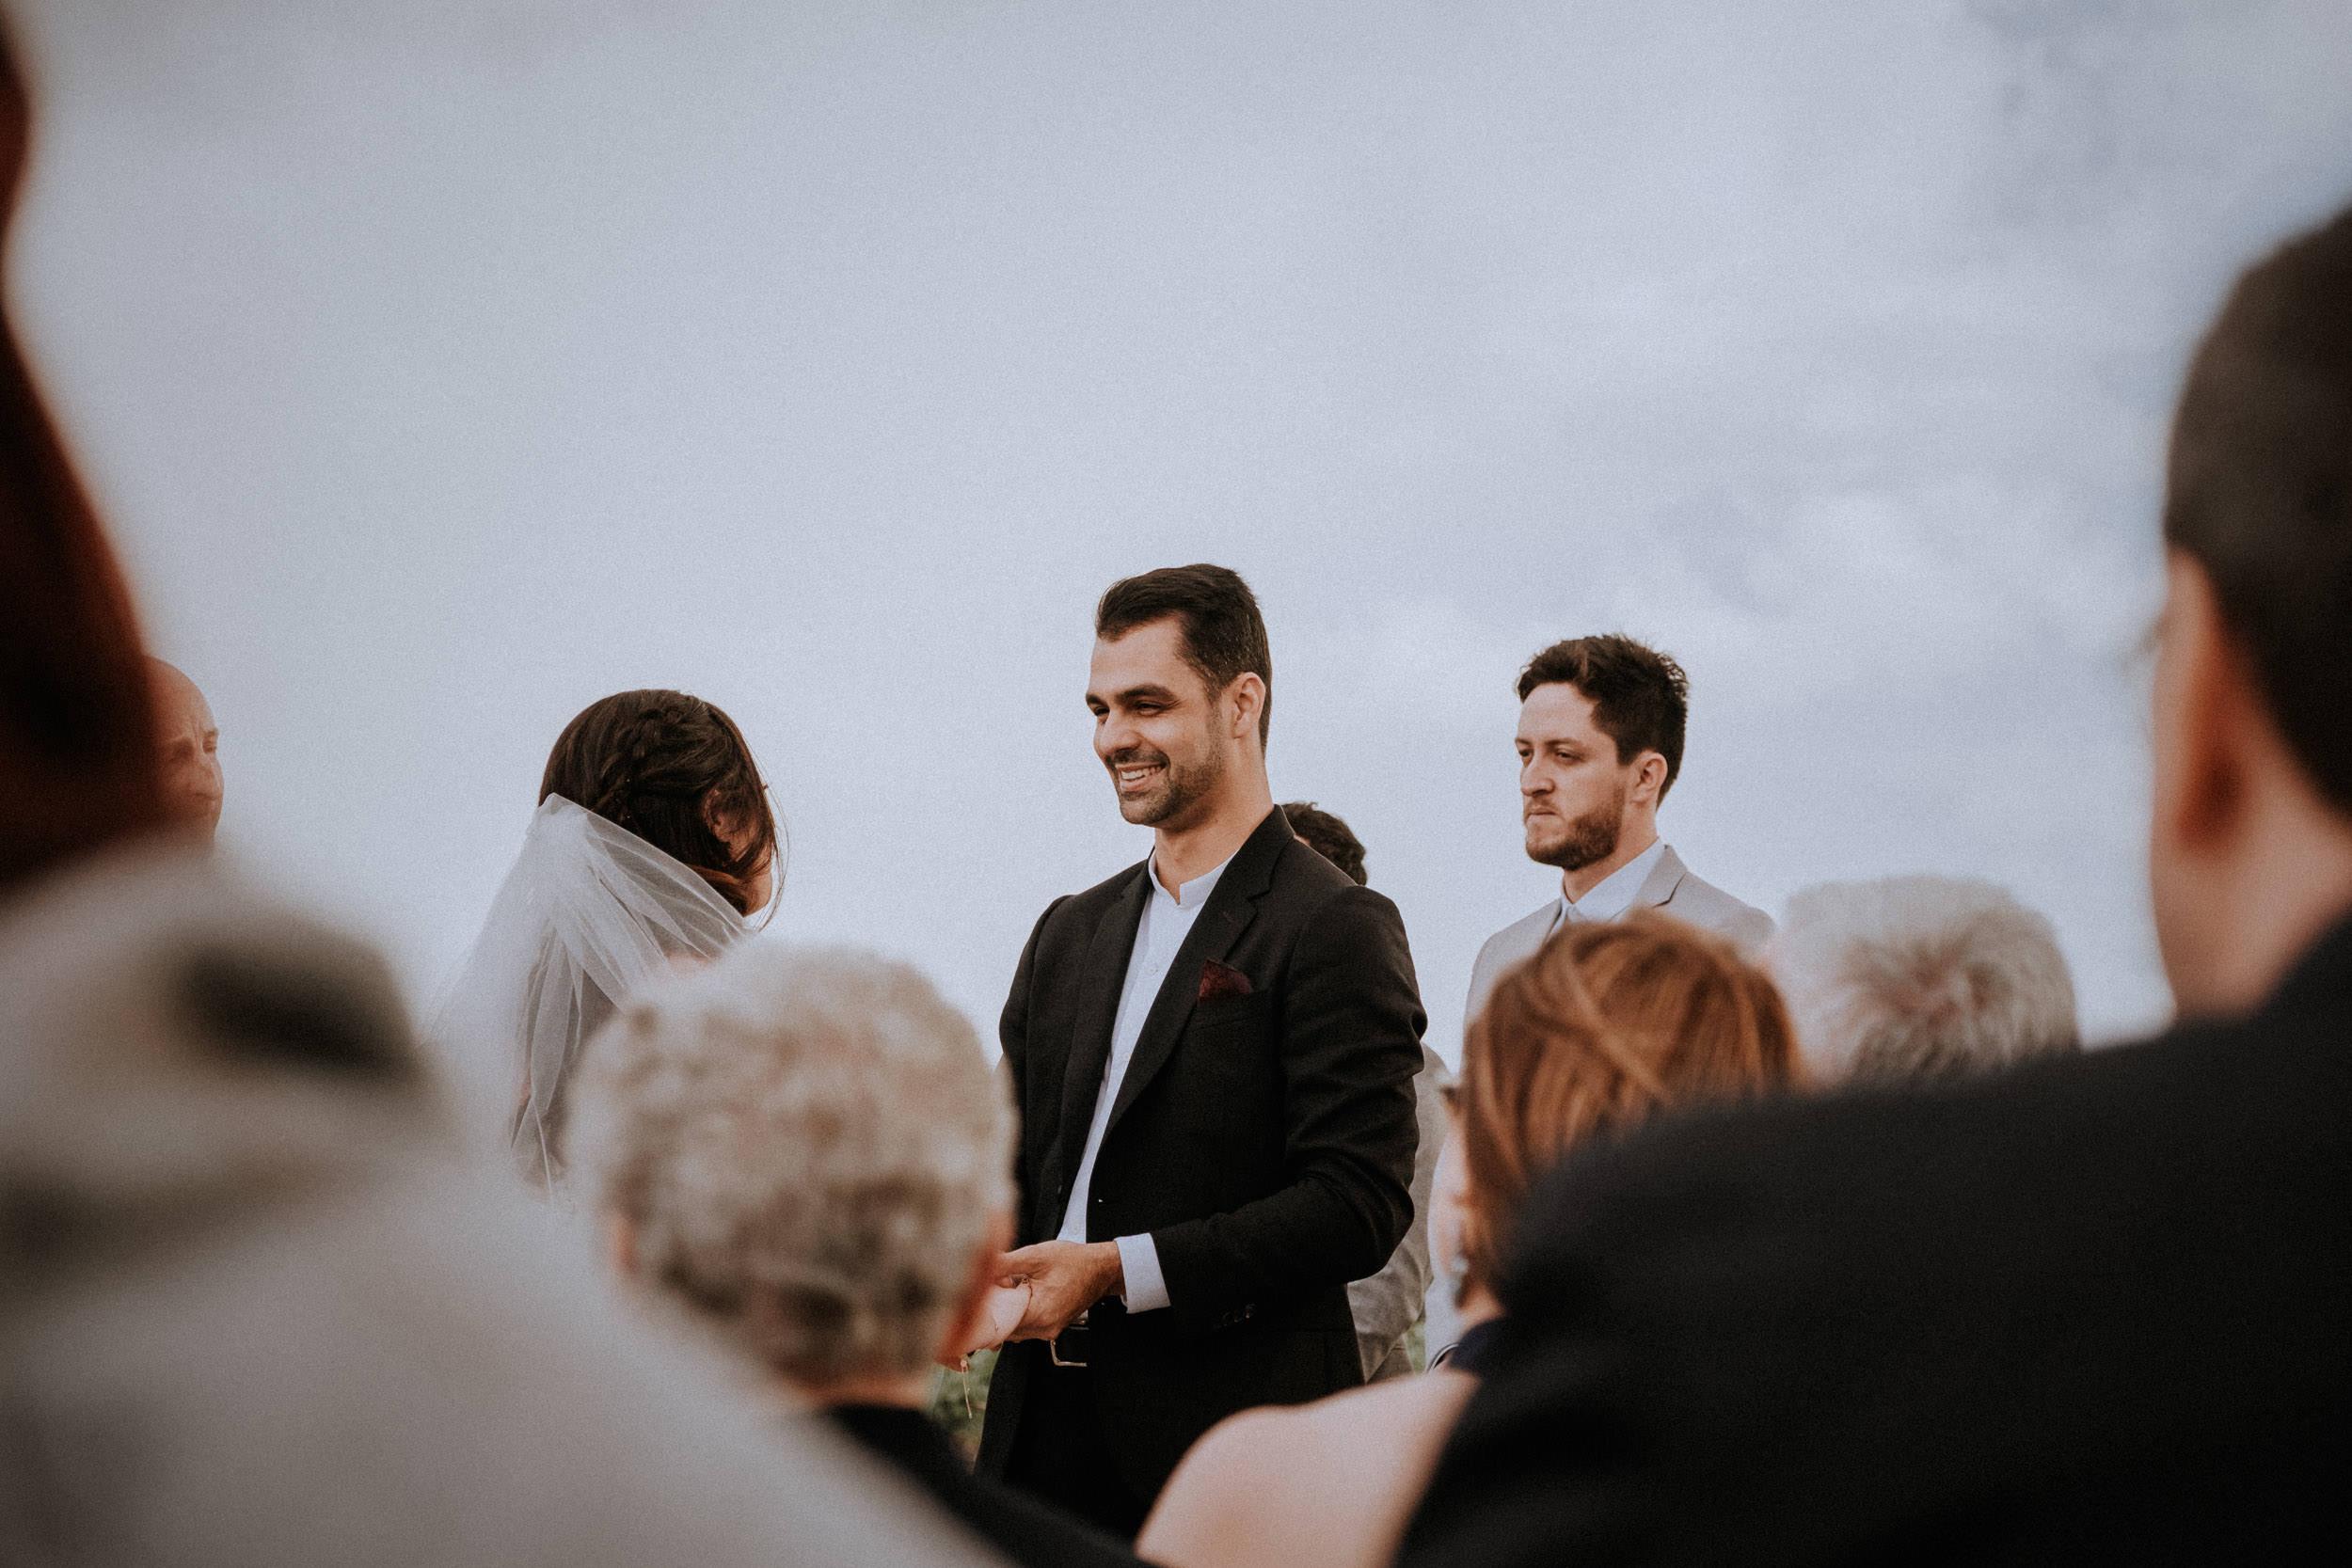 s+j_top_elopement wedding photography_kings & thieves_blog - 251.jpg